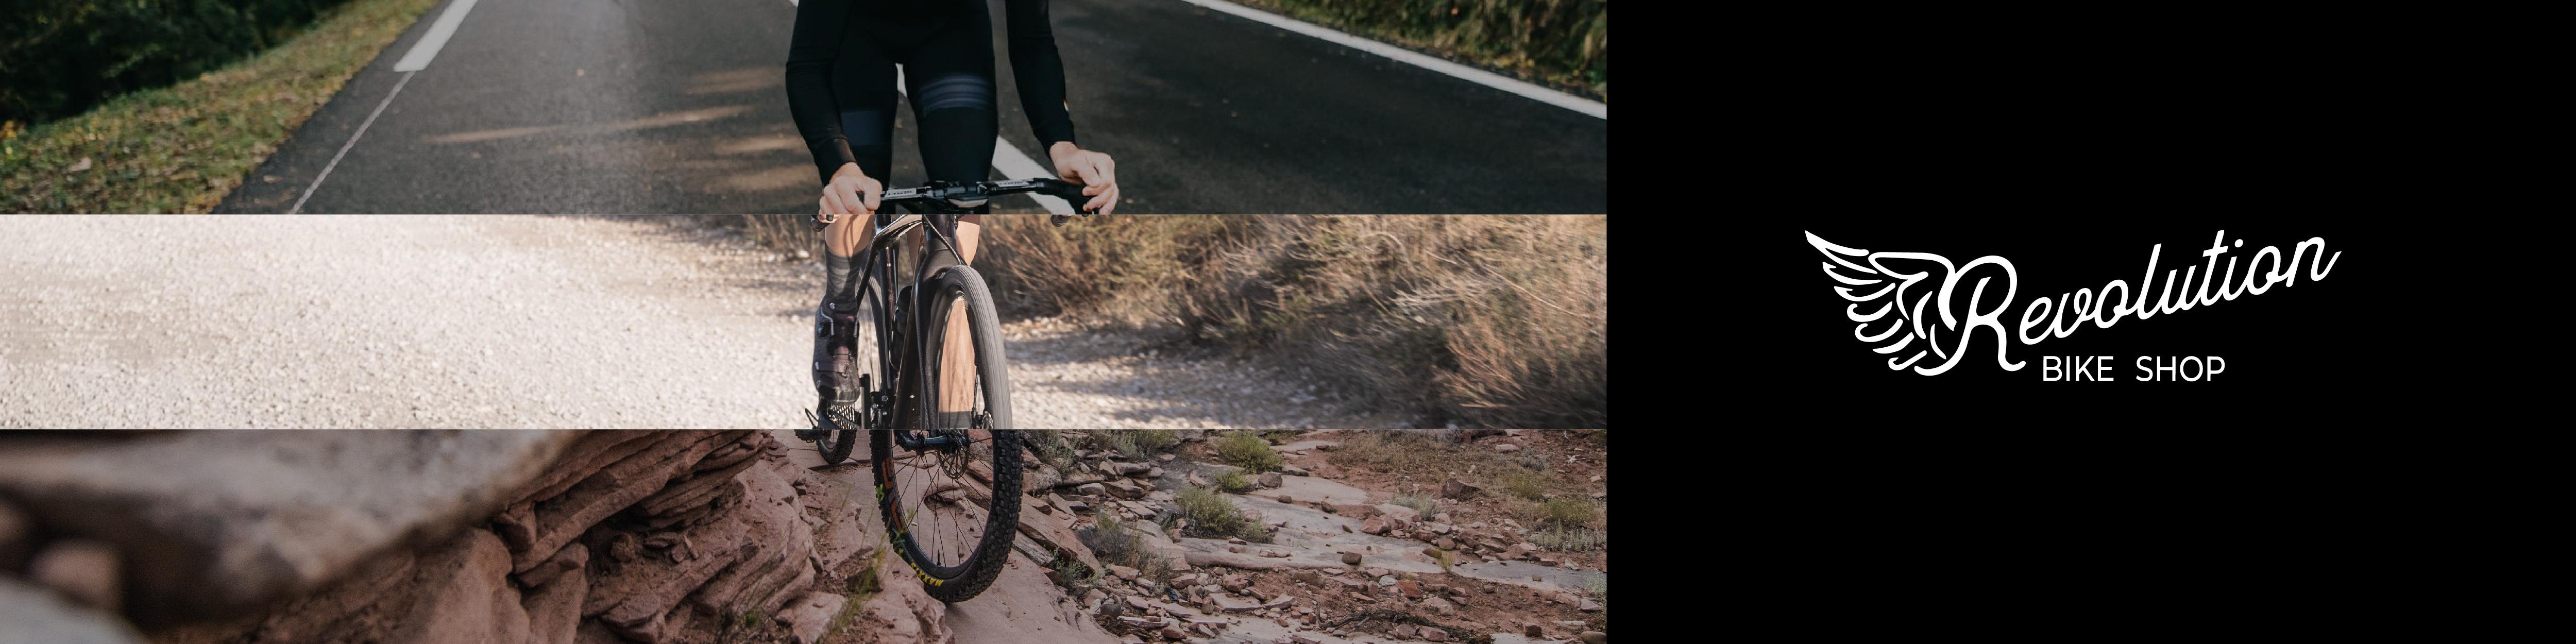 rev-bikes-01.jpg